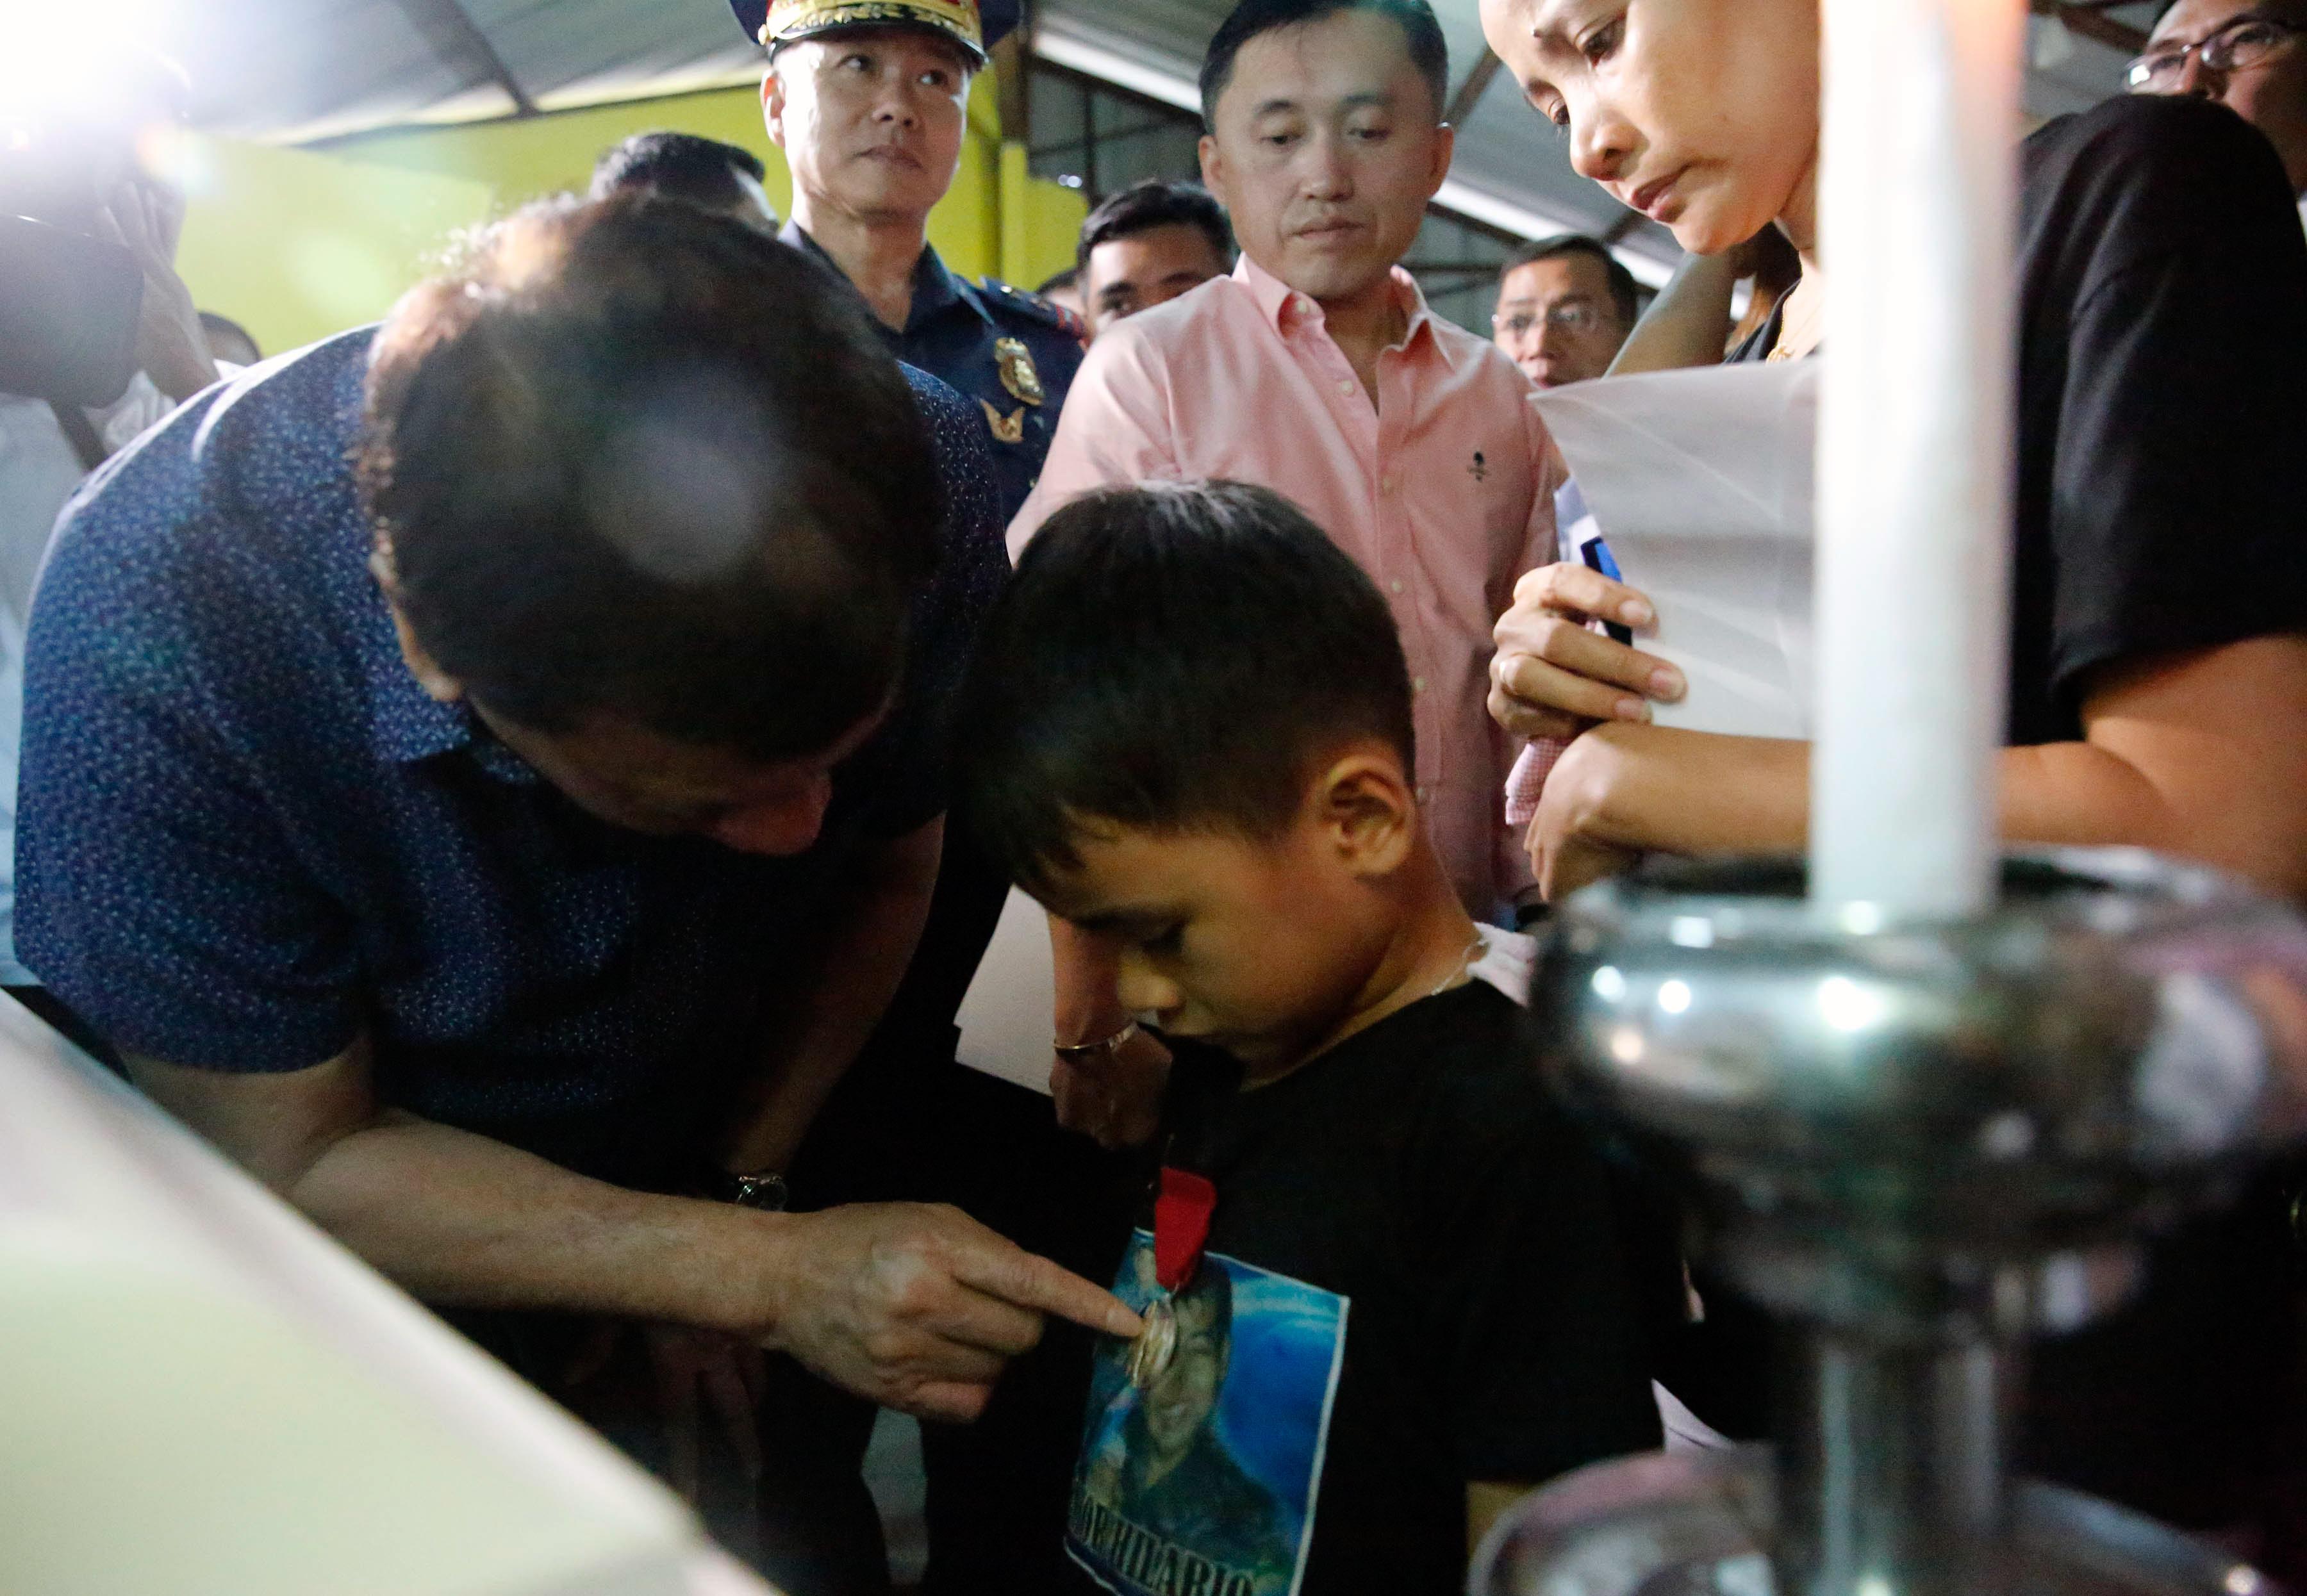 TRIBUTE TO A FATHER. President Rodrigo Duterte pins the Order of Lapu-Lapu Kalasag Medal onto the shirt of 6-year-old Jun Hilario. Presidential photo